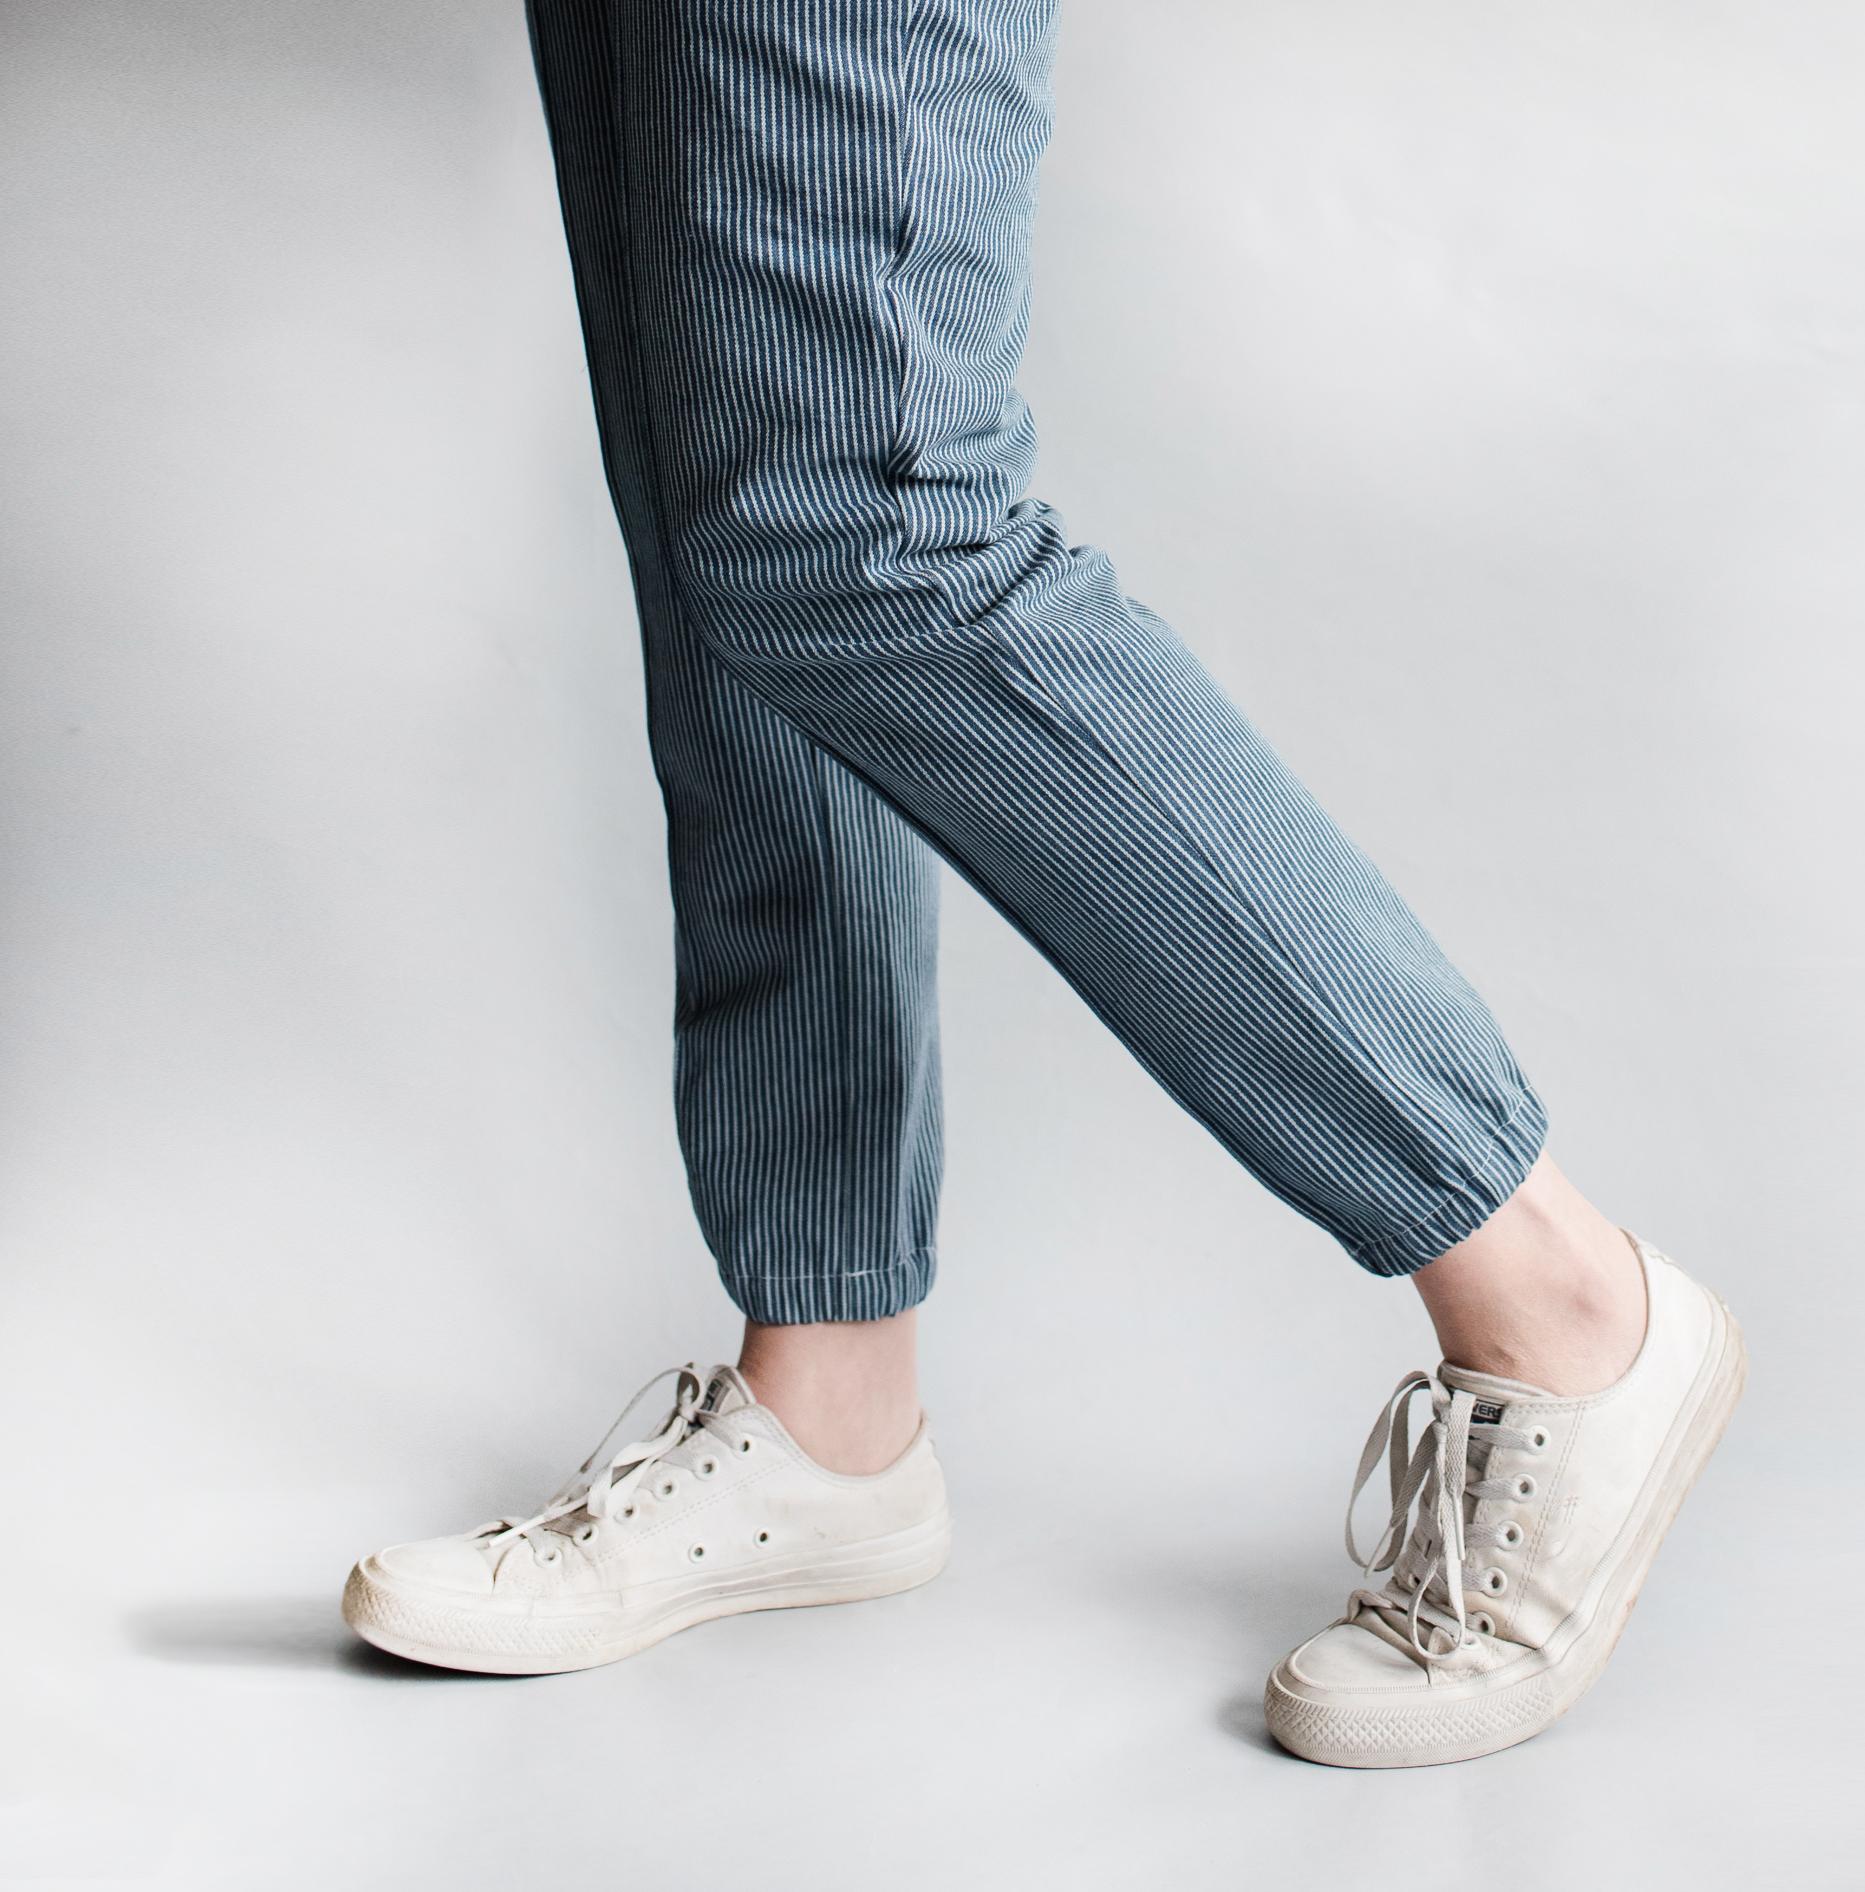 robinson-pdf-sewing-trouser35.jpg